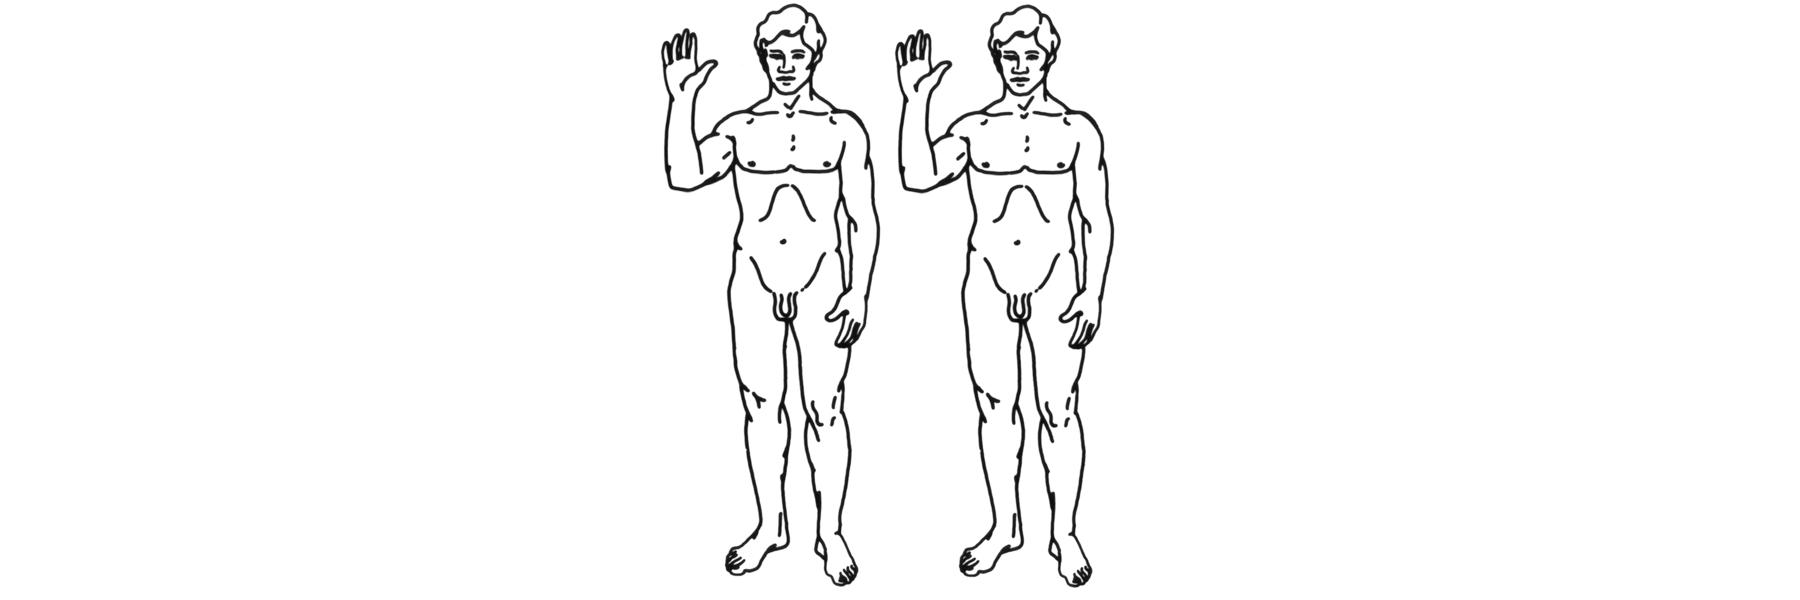 Human clones graphic